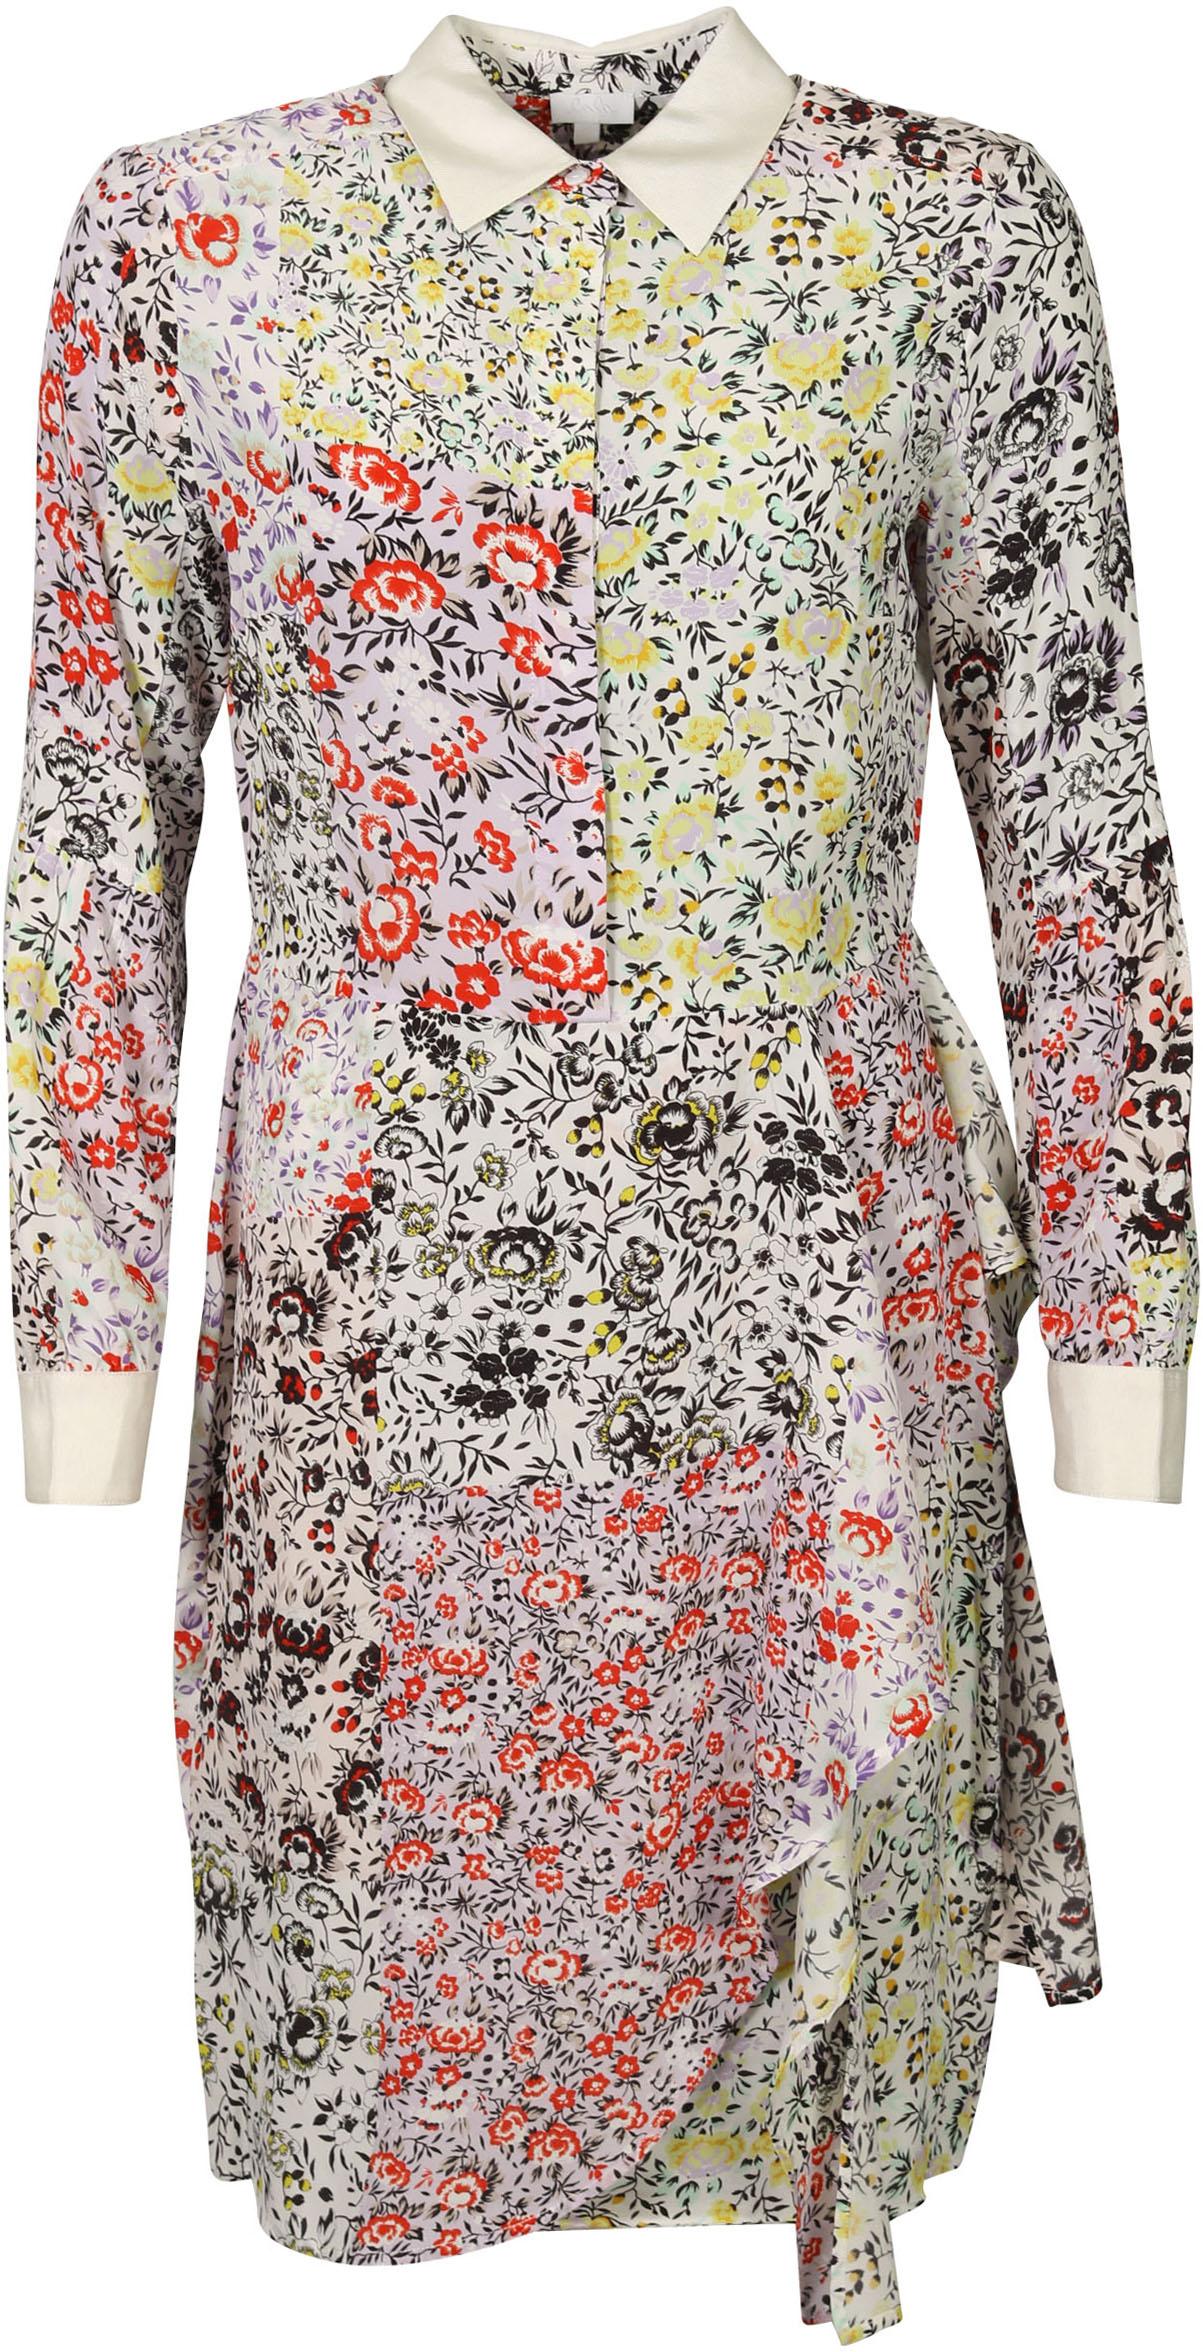 women's lala berlin dress dionne oasis patchwork flowers printed